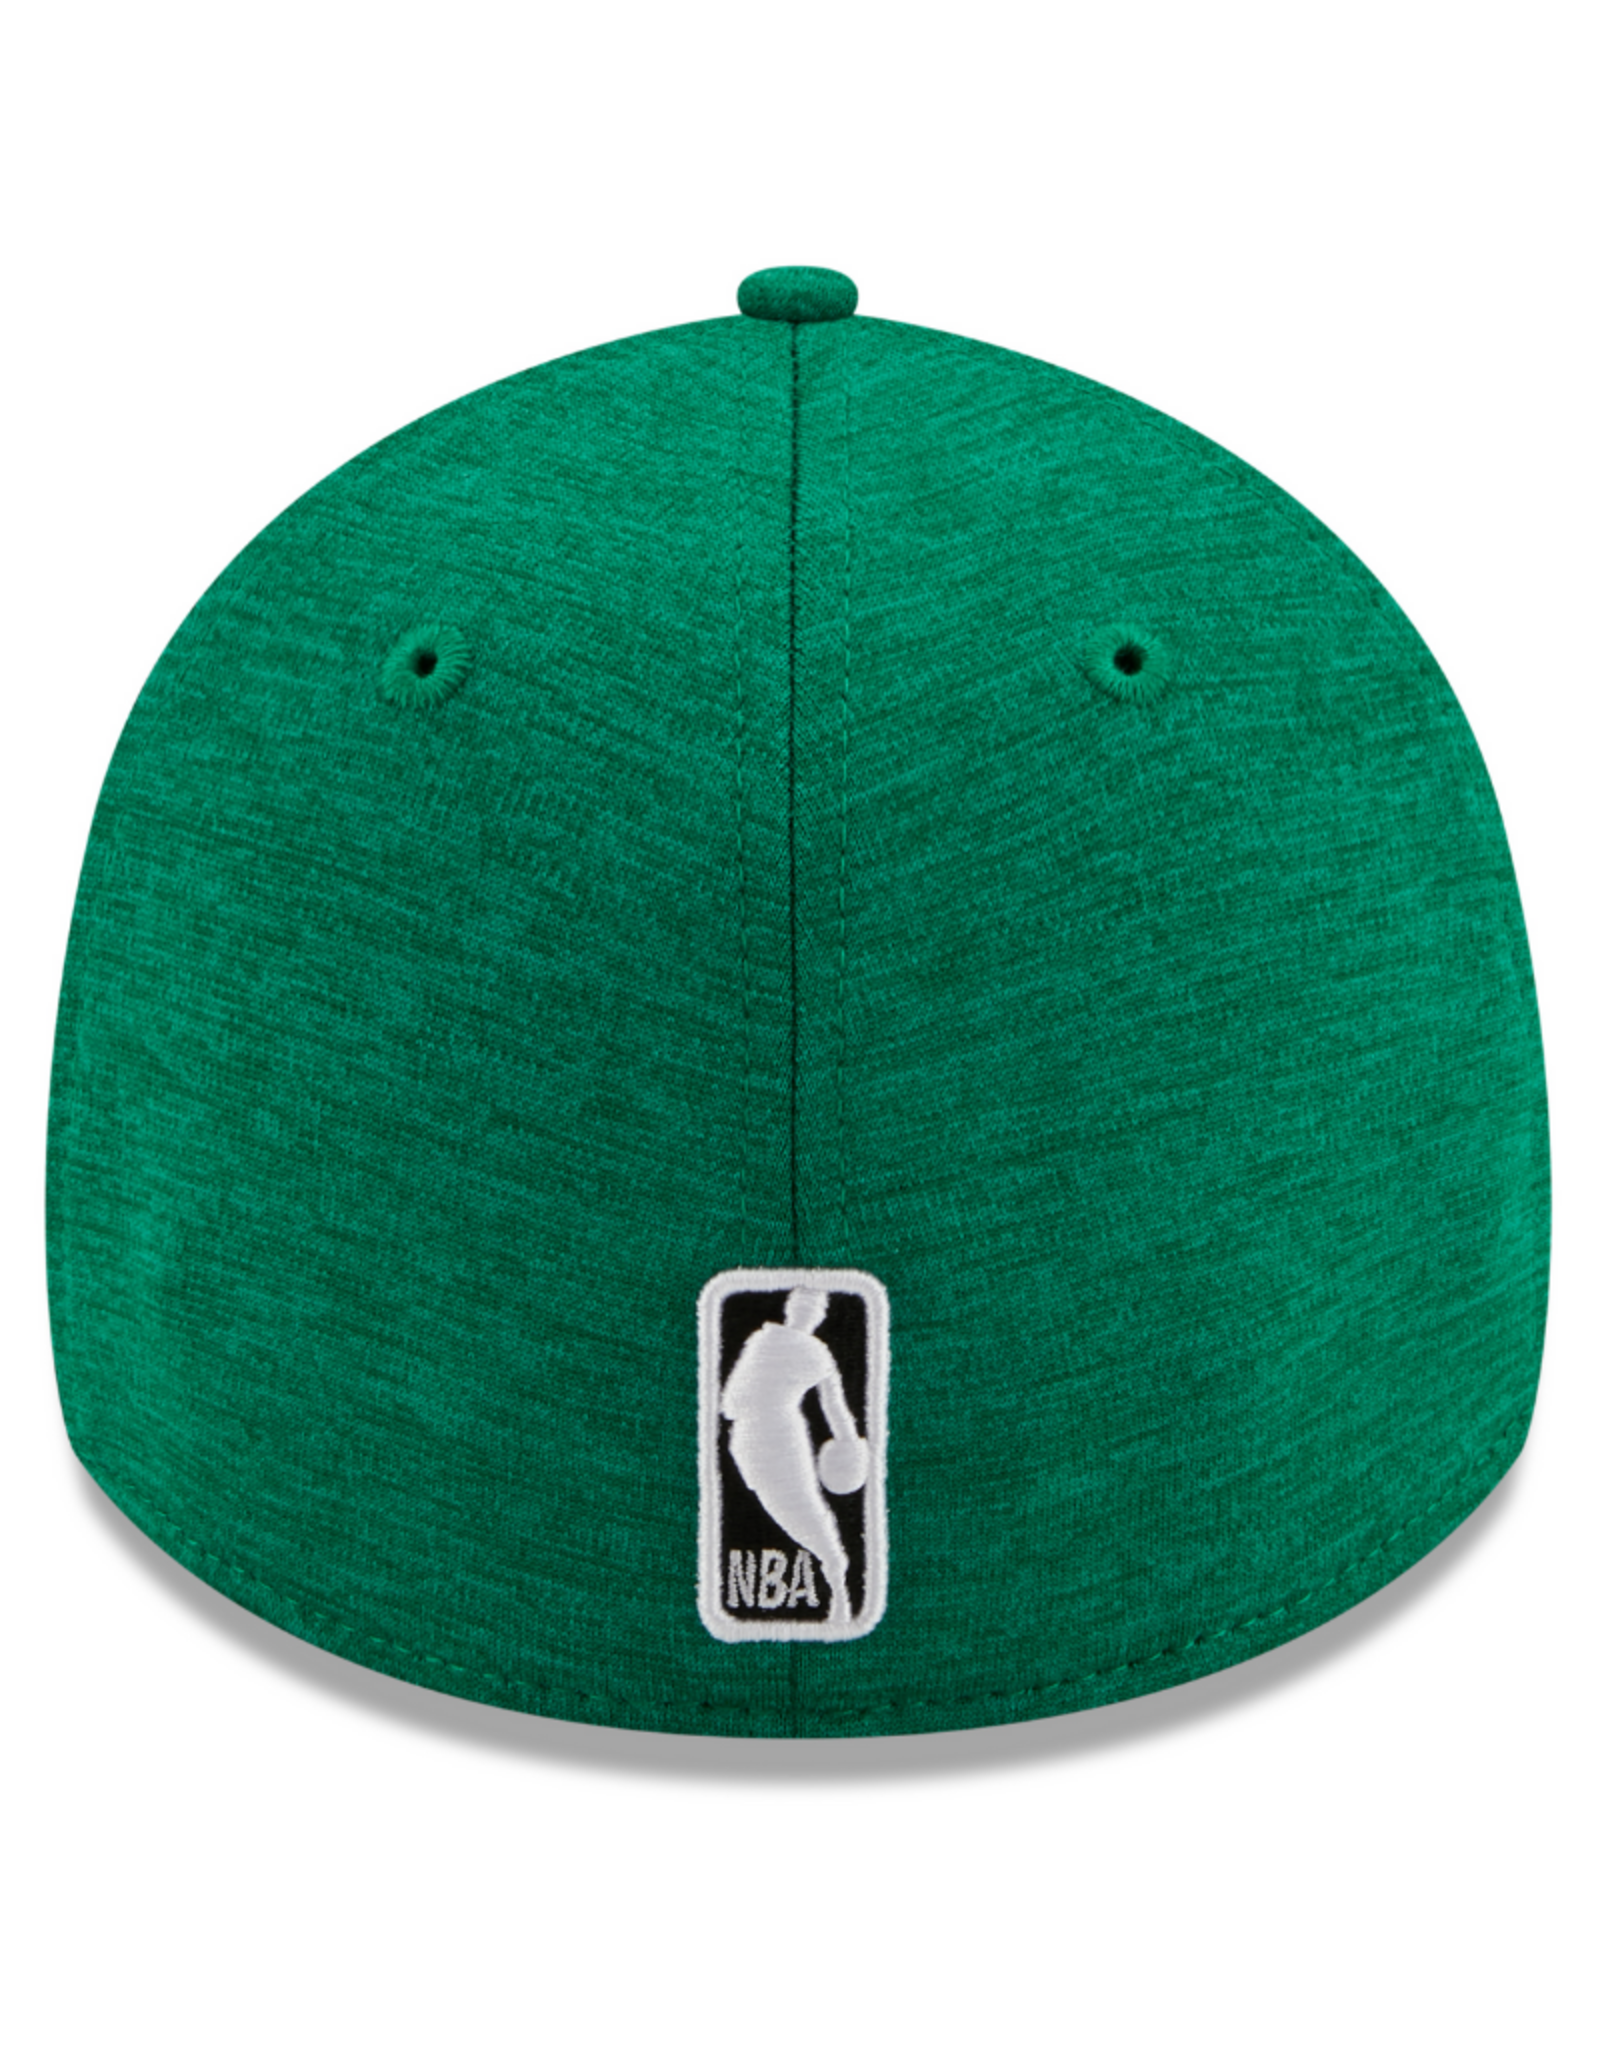 New Era Adult 39THIRTY Shadow B3 Hat Boston Celtics Green